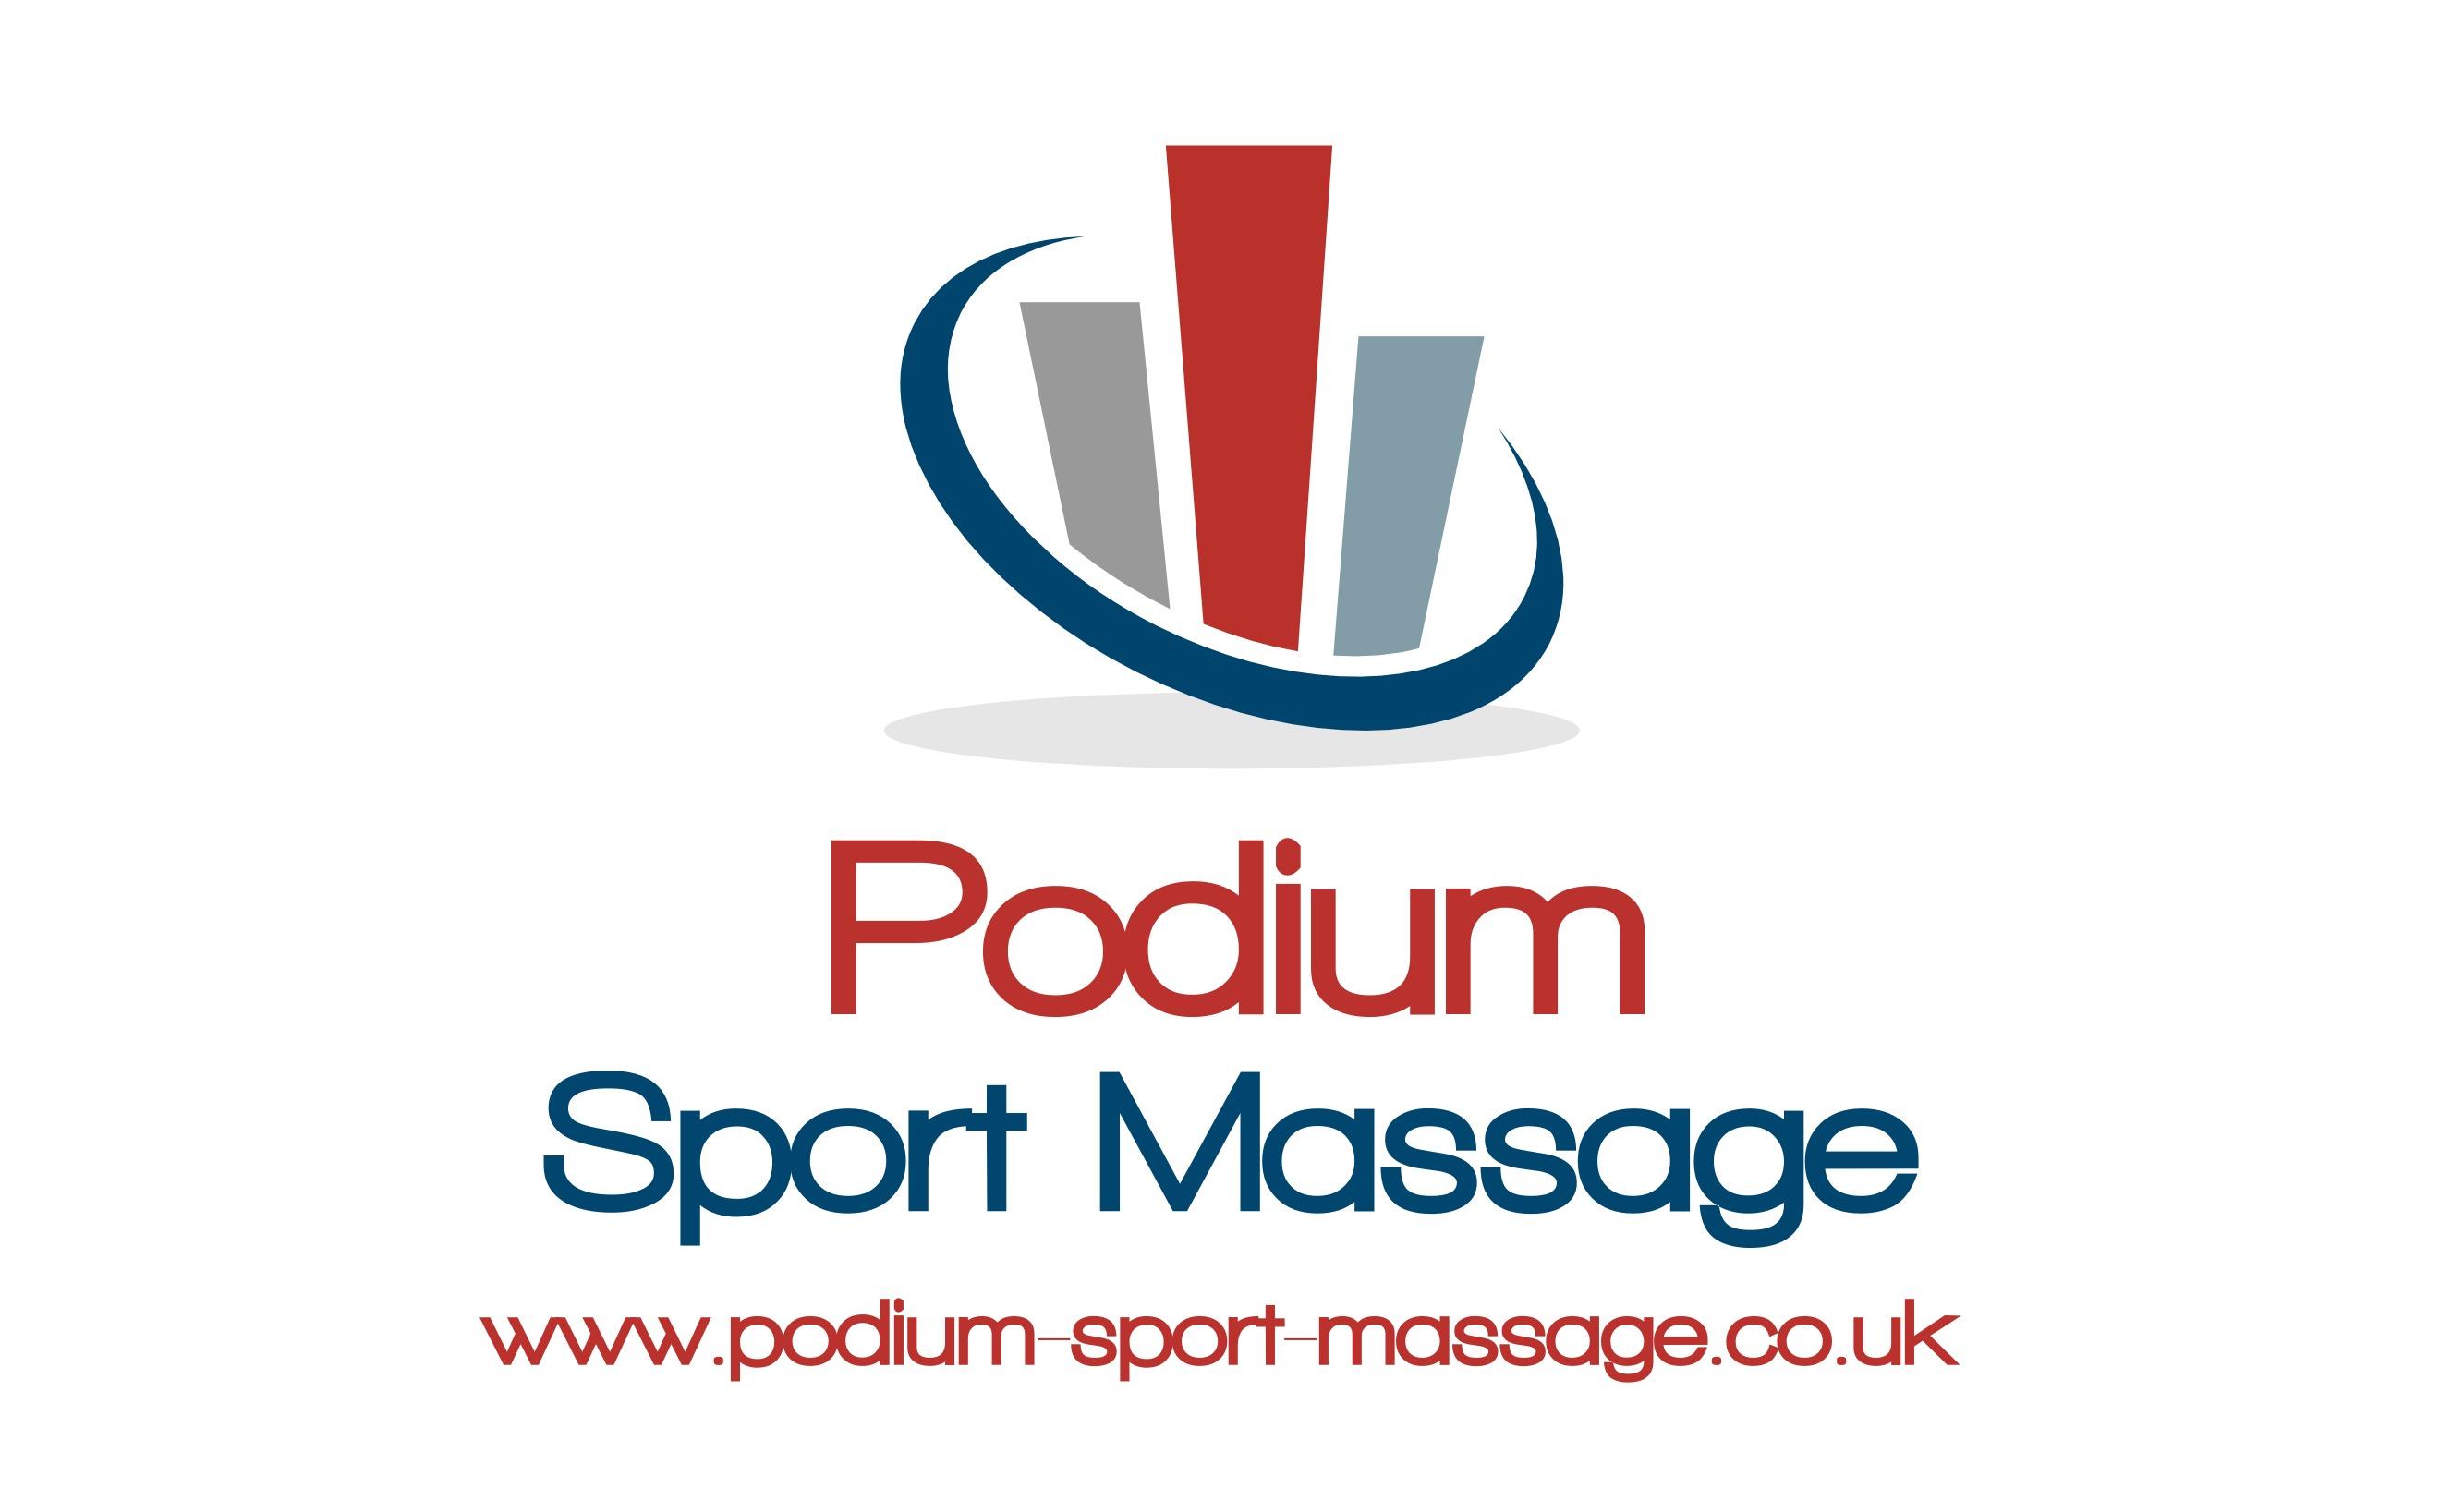 Podium Sport Massage